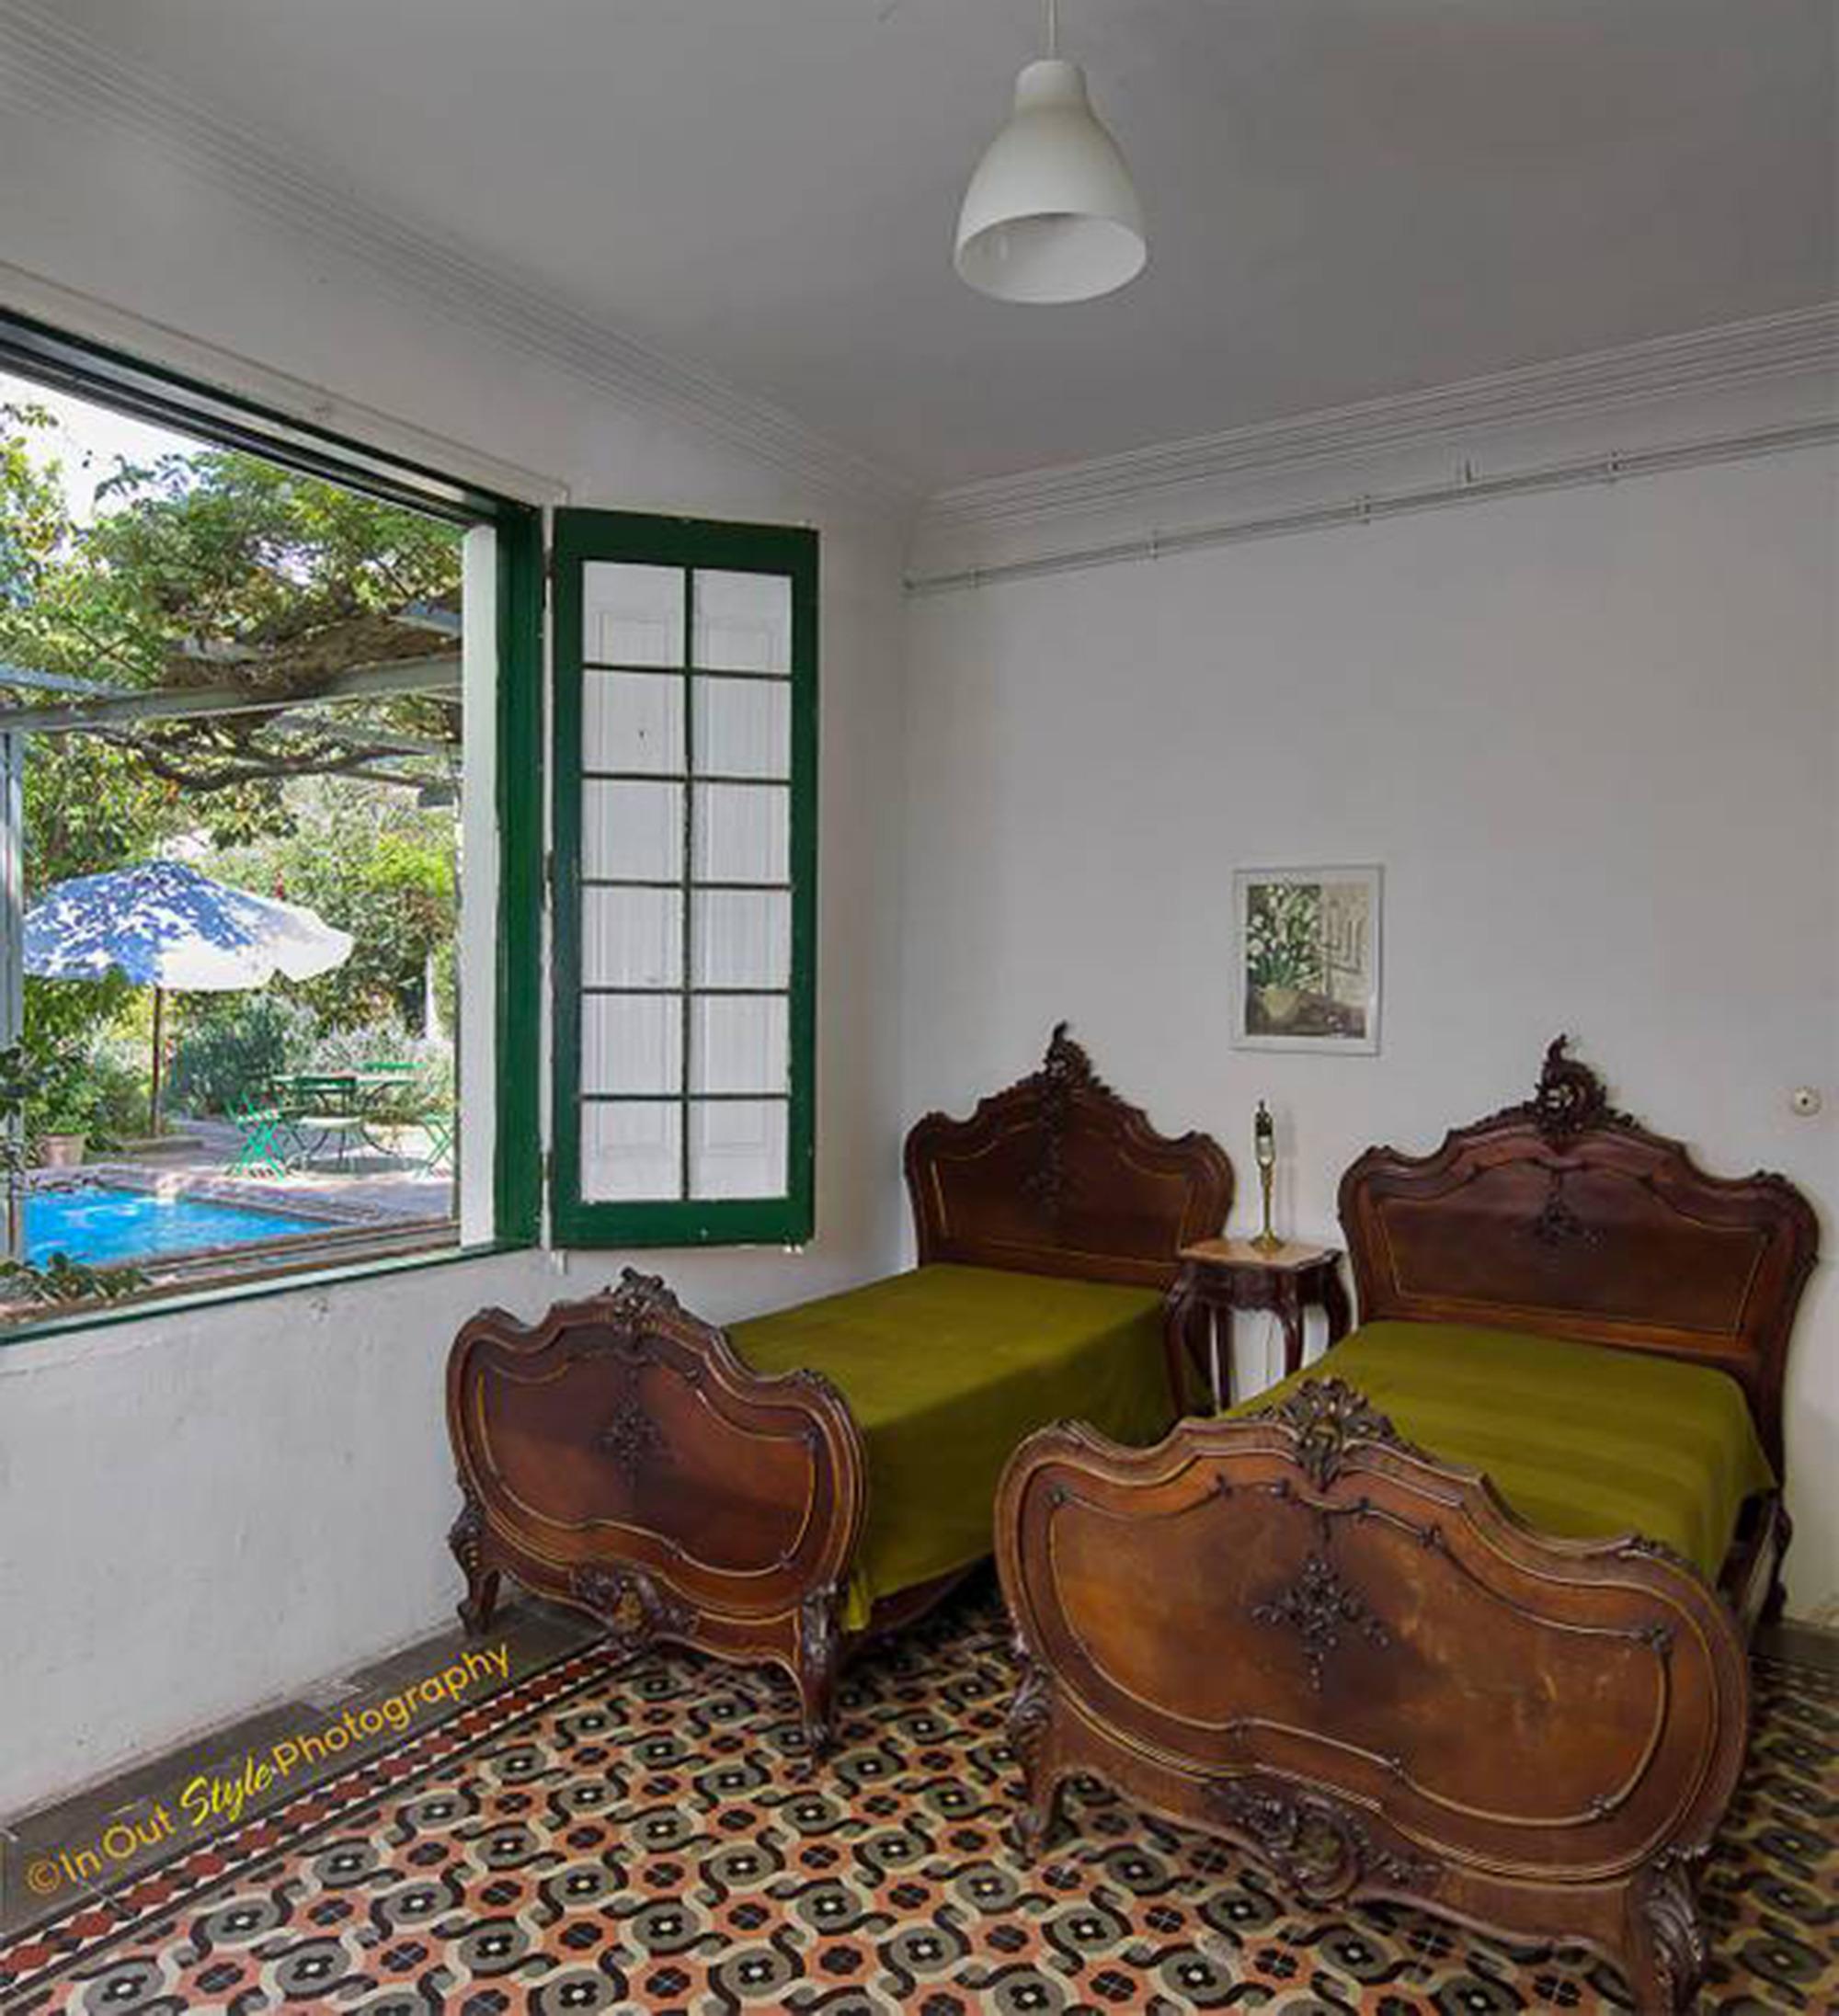 Ferienhaus Jugendstil Strandhaus (2626425), Caldes d'Estrac, Costa del Meresme, Katalonien, Spanien, Bild 16